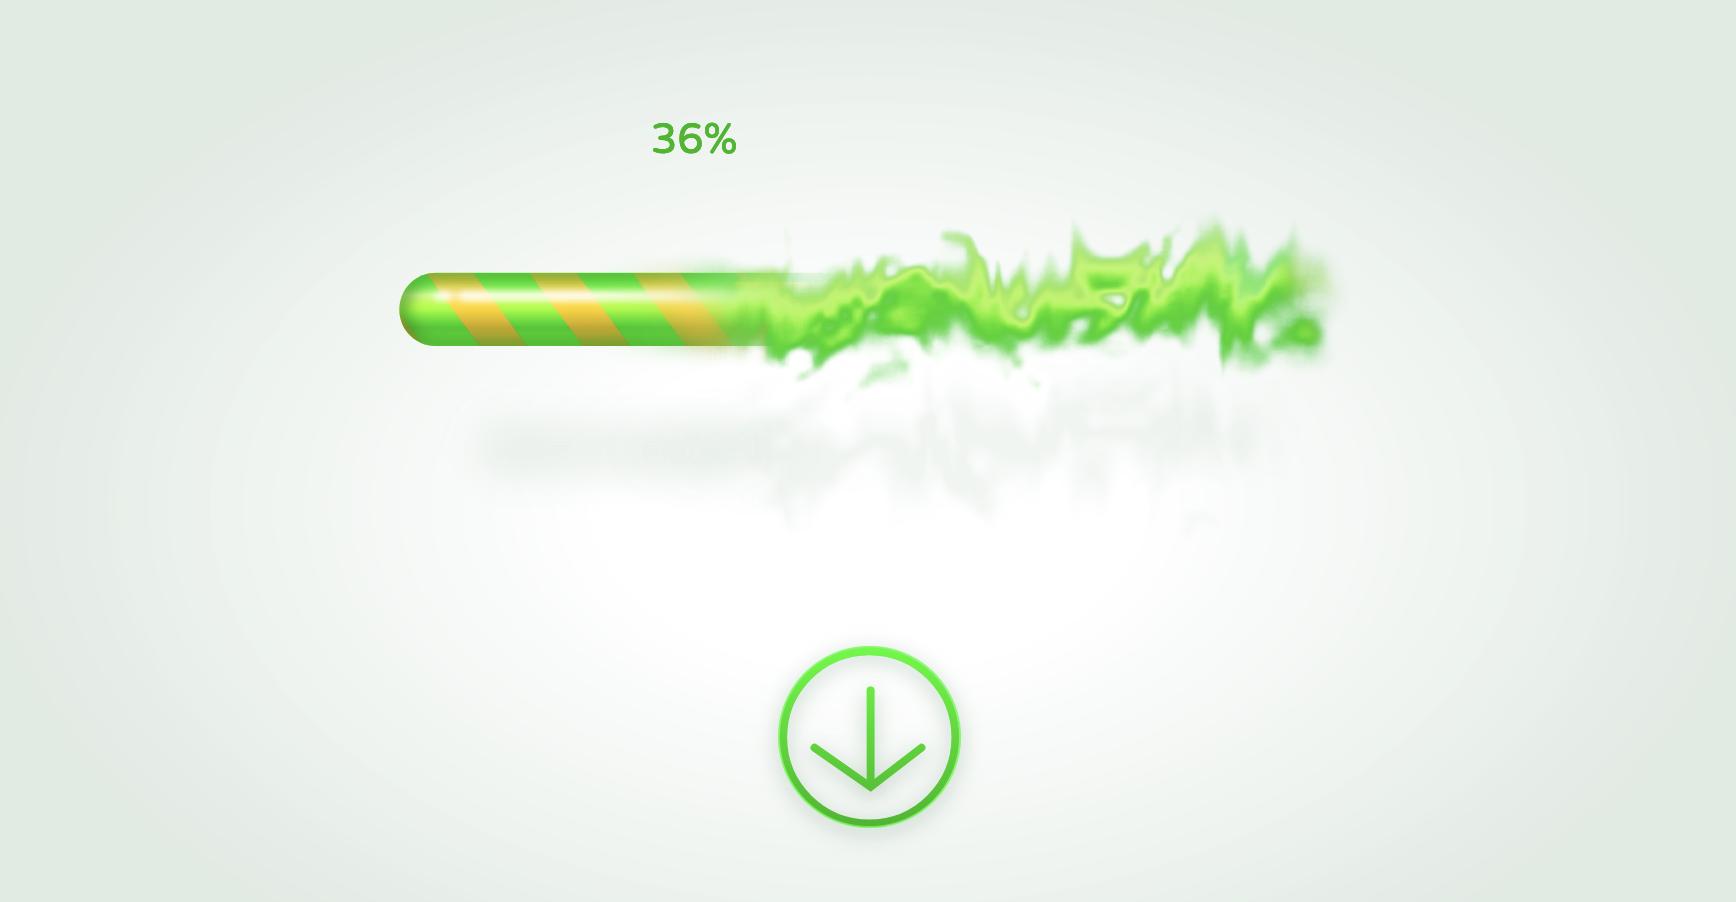 A fancy twirled progress bar